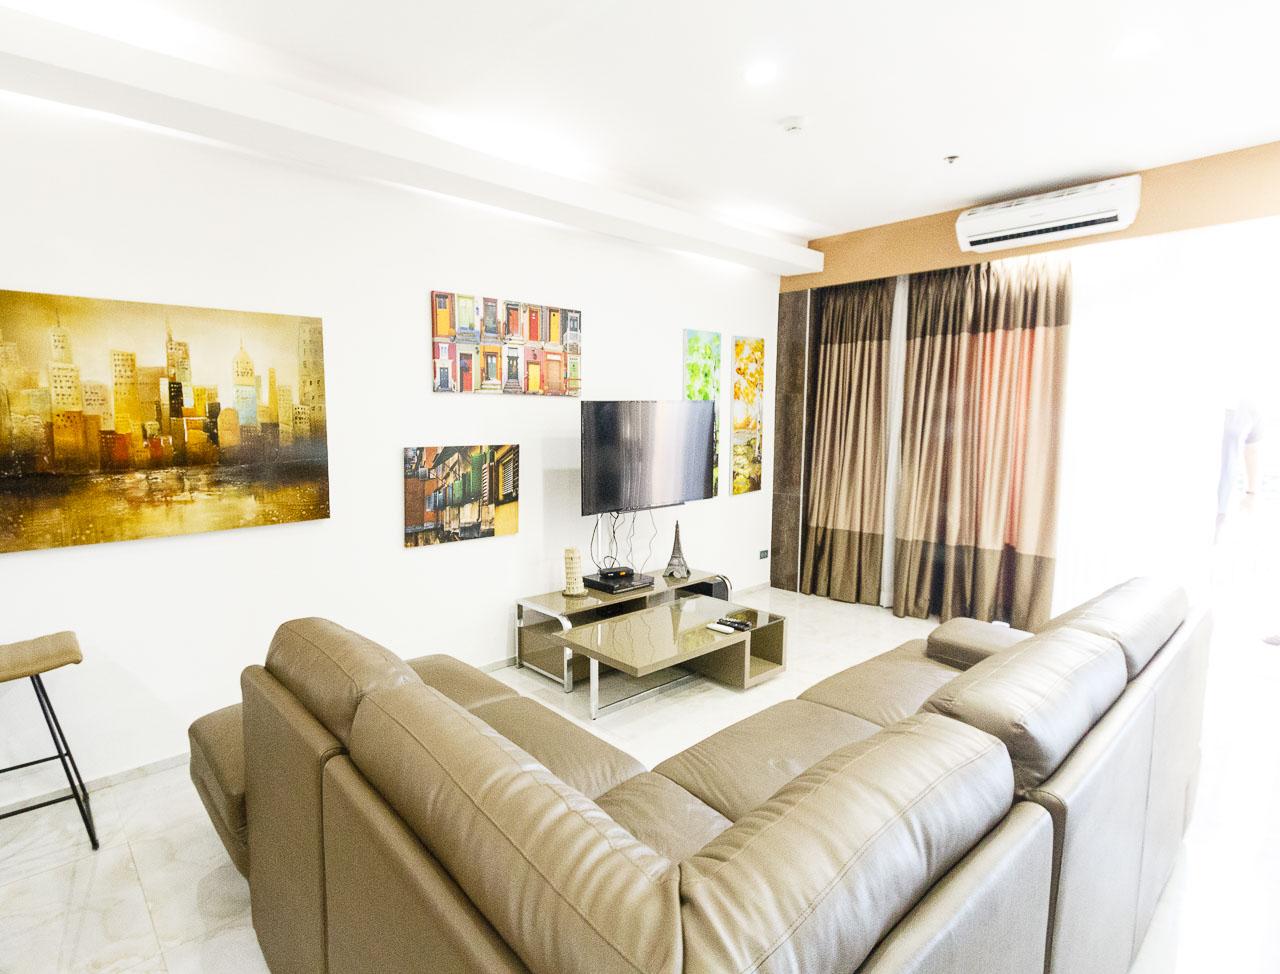 2 Bedroom Condo for Rent in Cebu Business Park